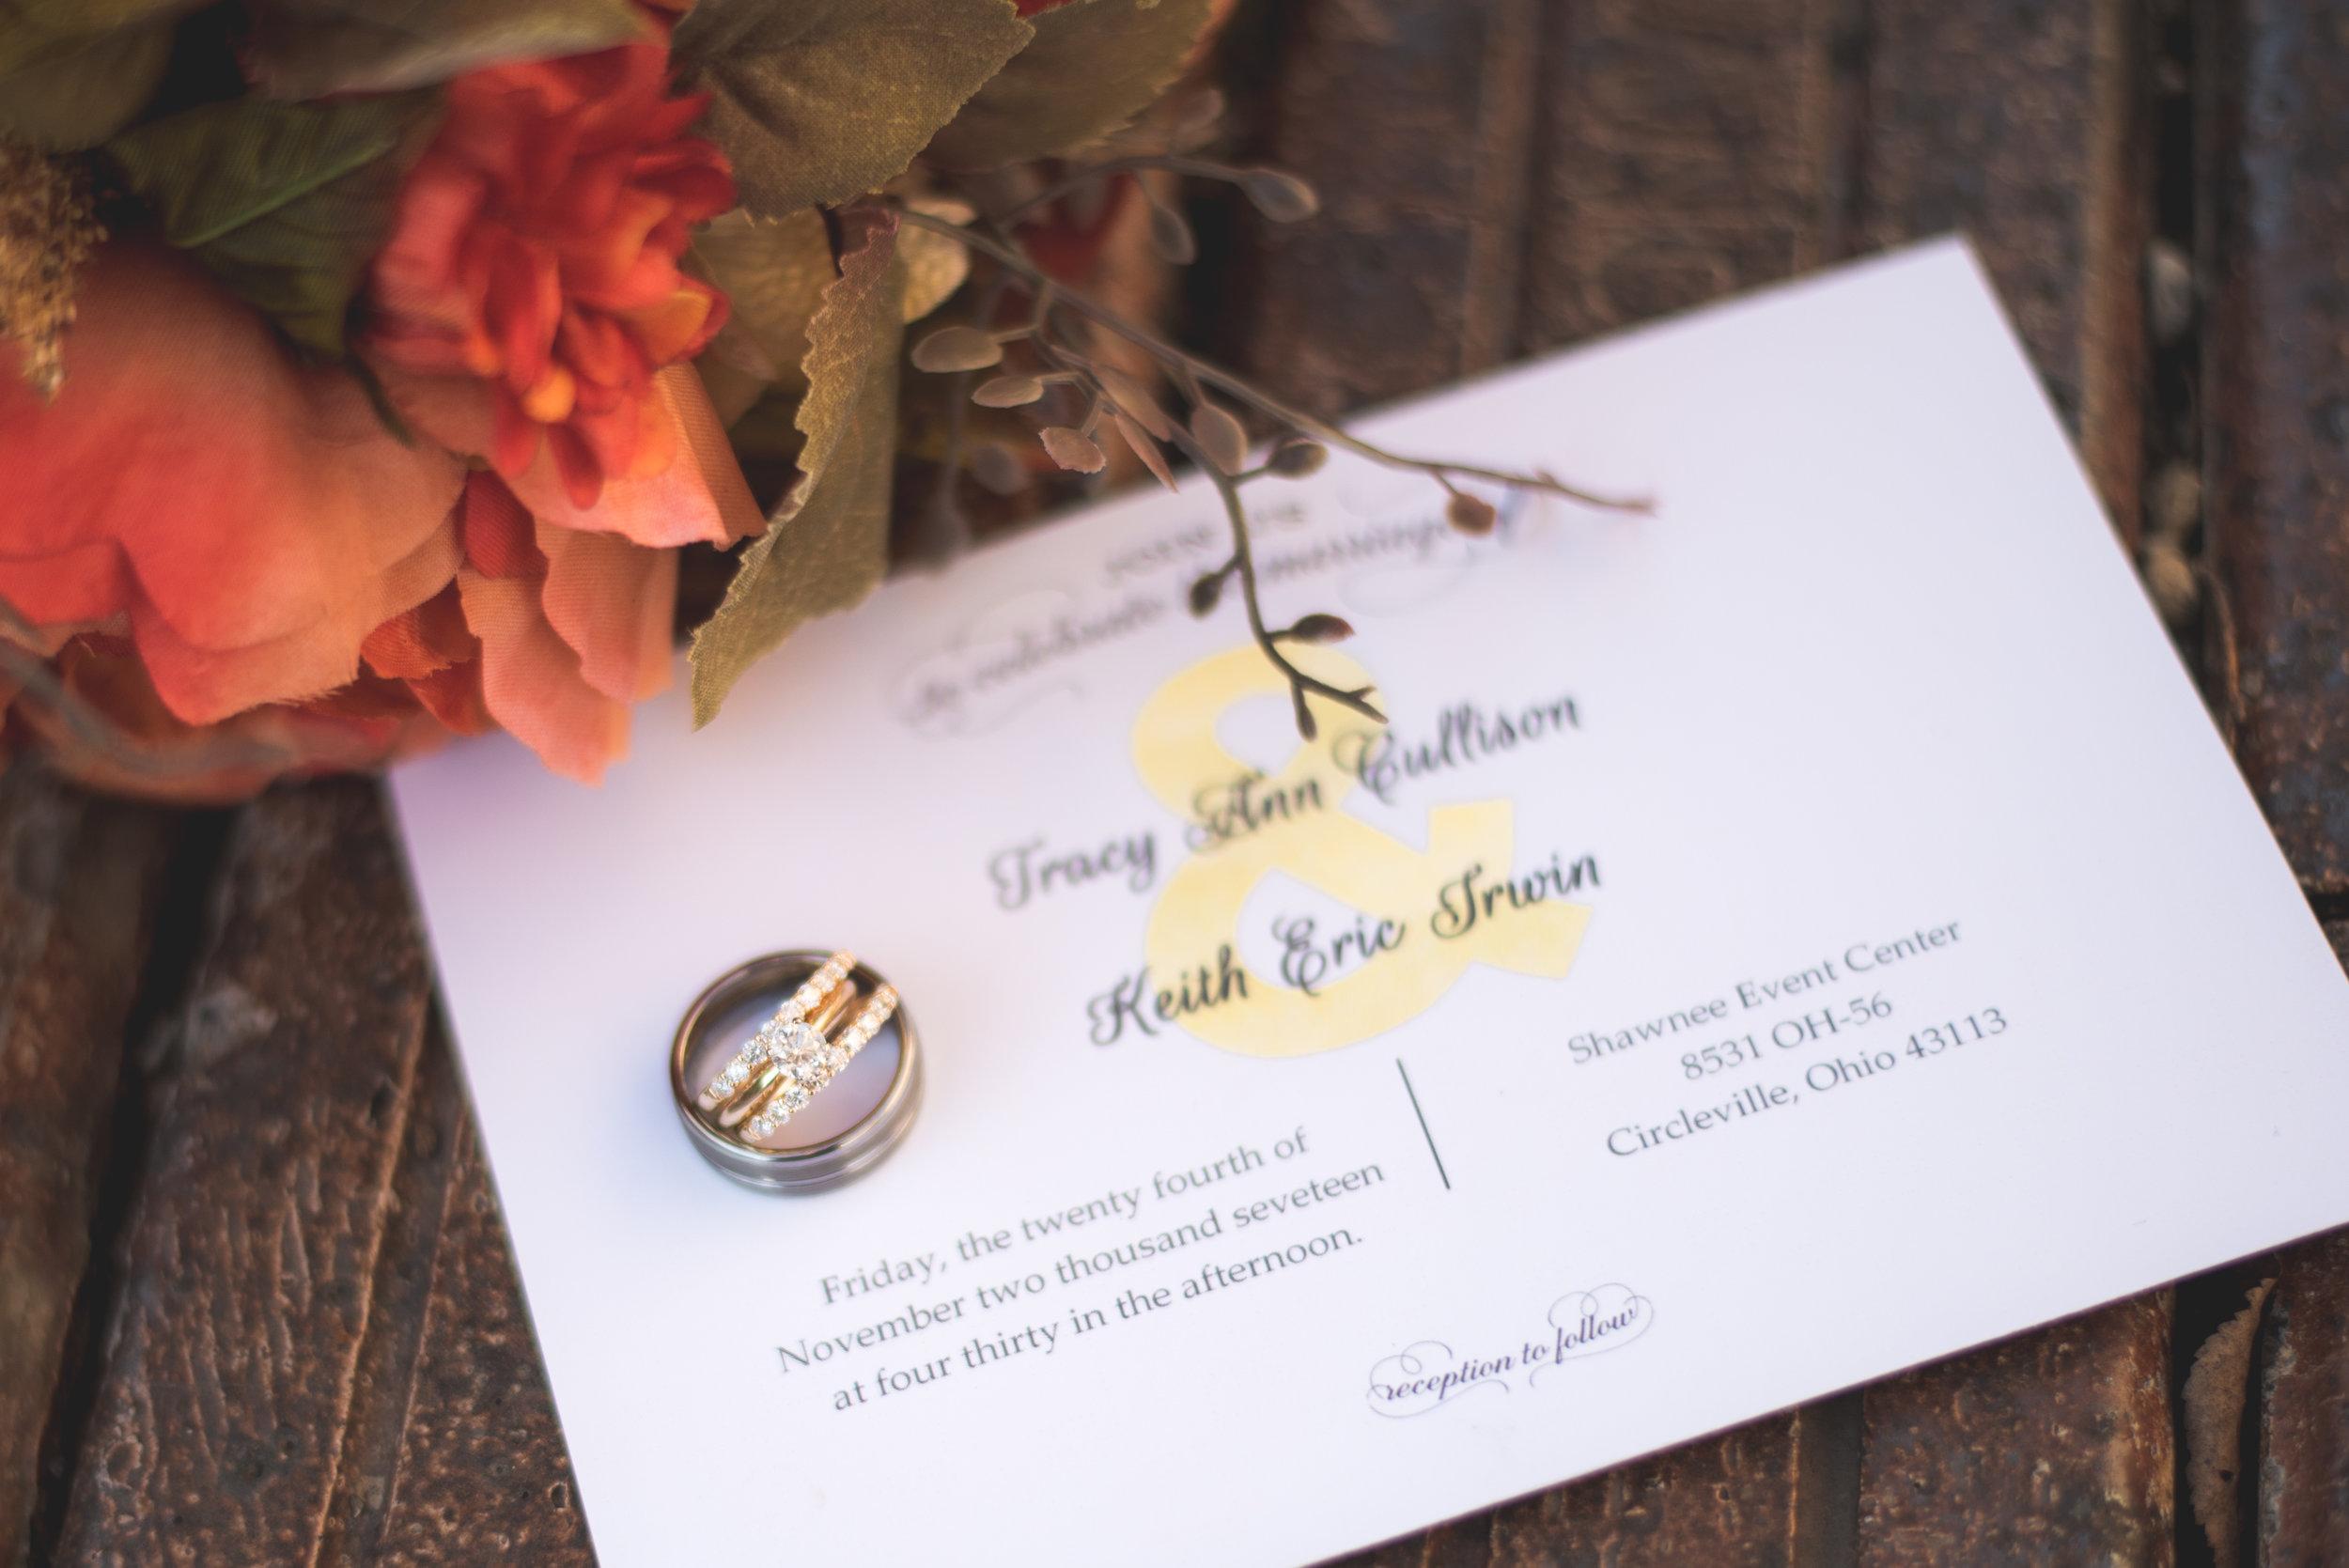 Tracy keith wedding at shawnee event center circleville ohio wedding invitation columbus ohio photographer flowers rings details shot monicamarmolfo Gallery